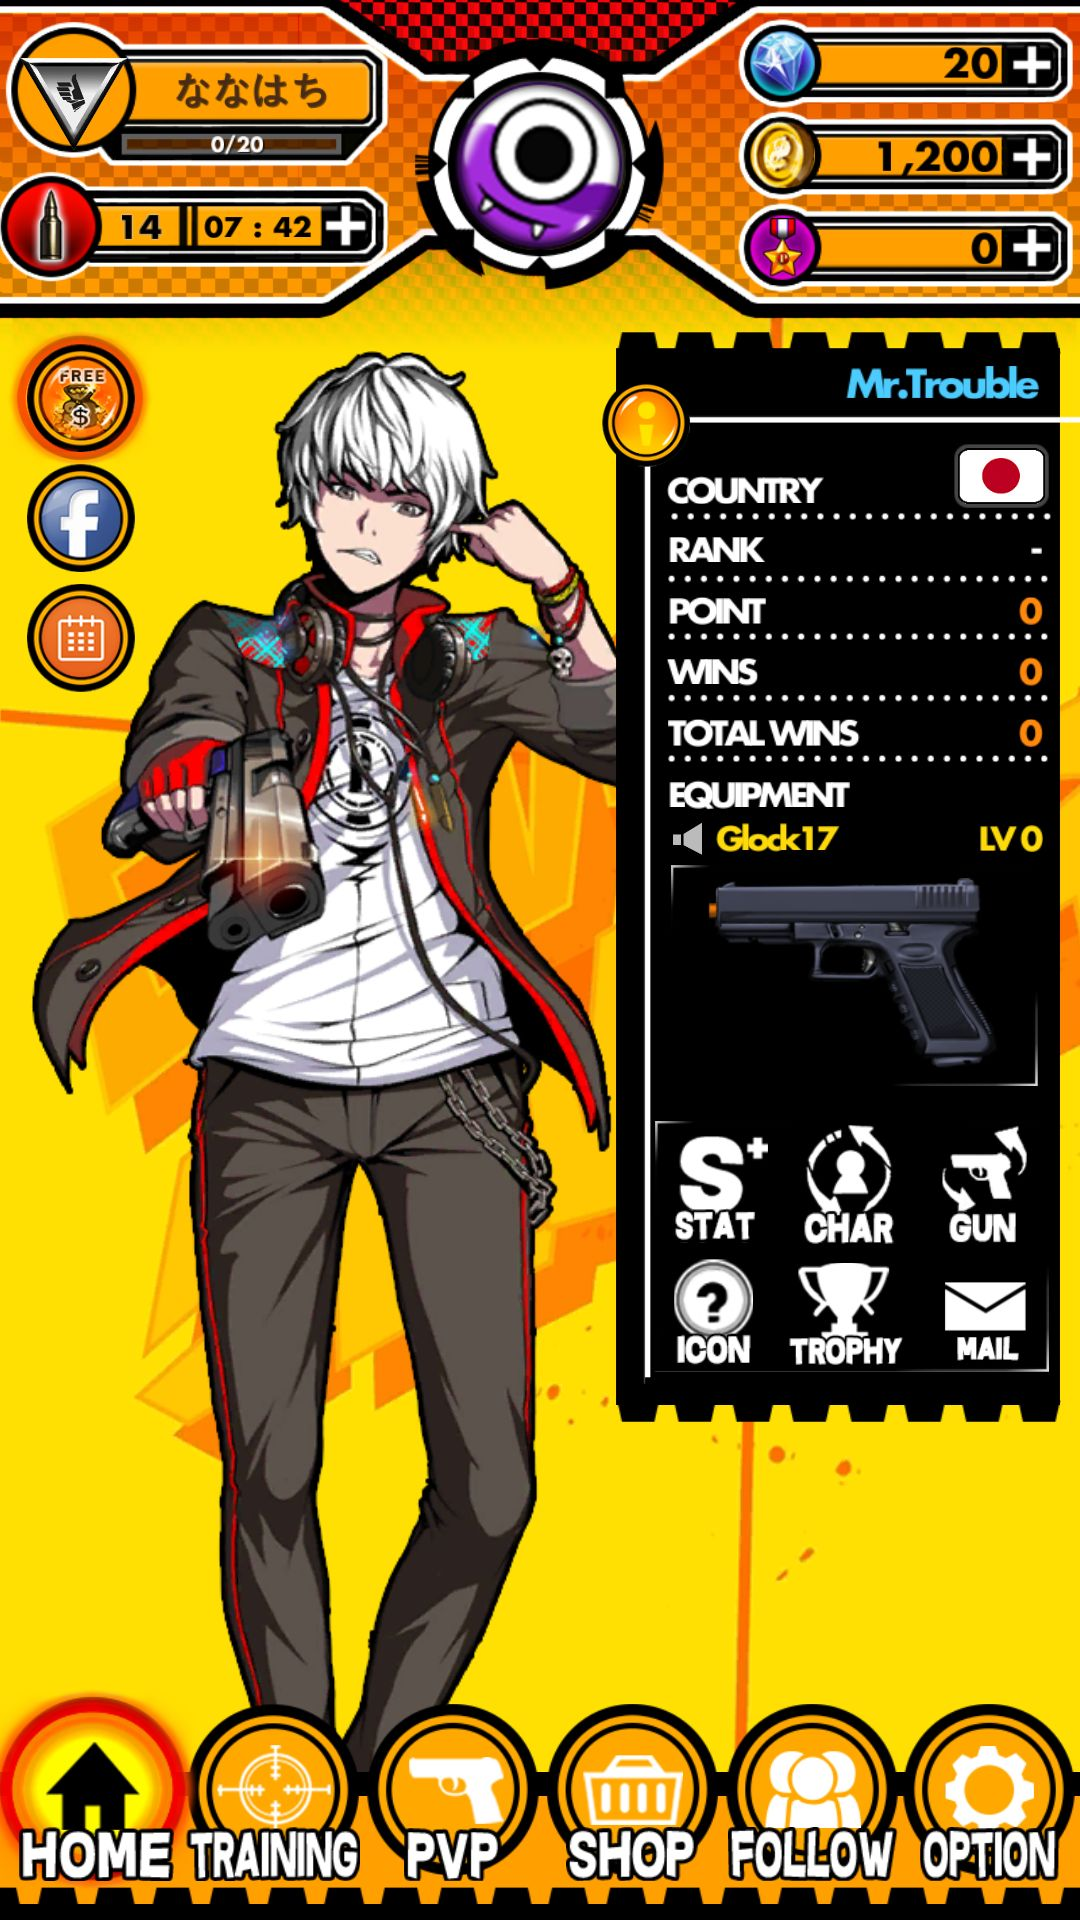 androidアプリ ガンスリンガー(GunSlinger - The Fast Gun)攻略スクリーンショット1